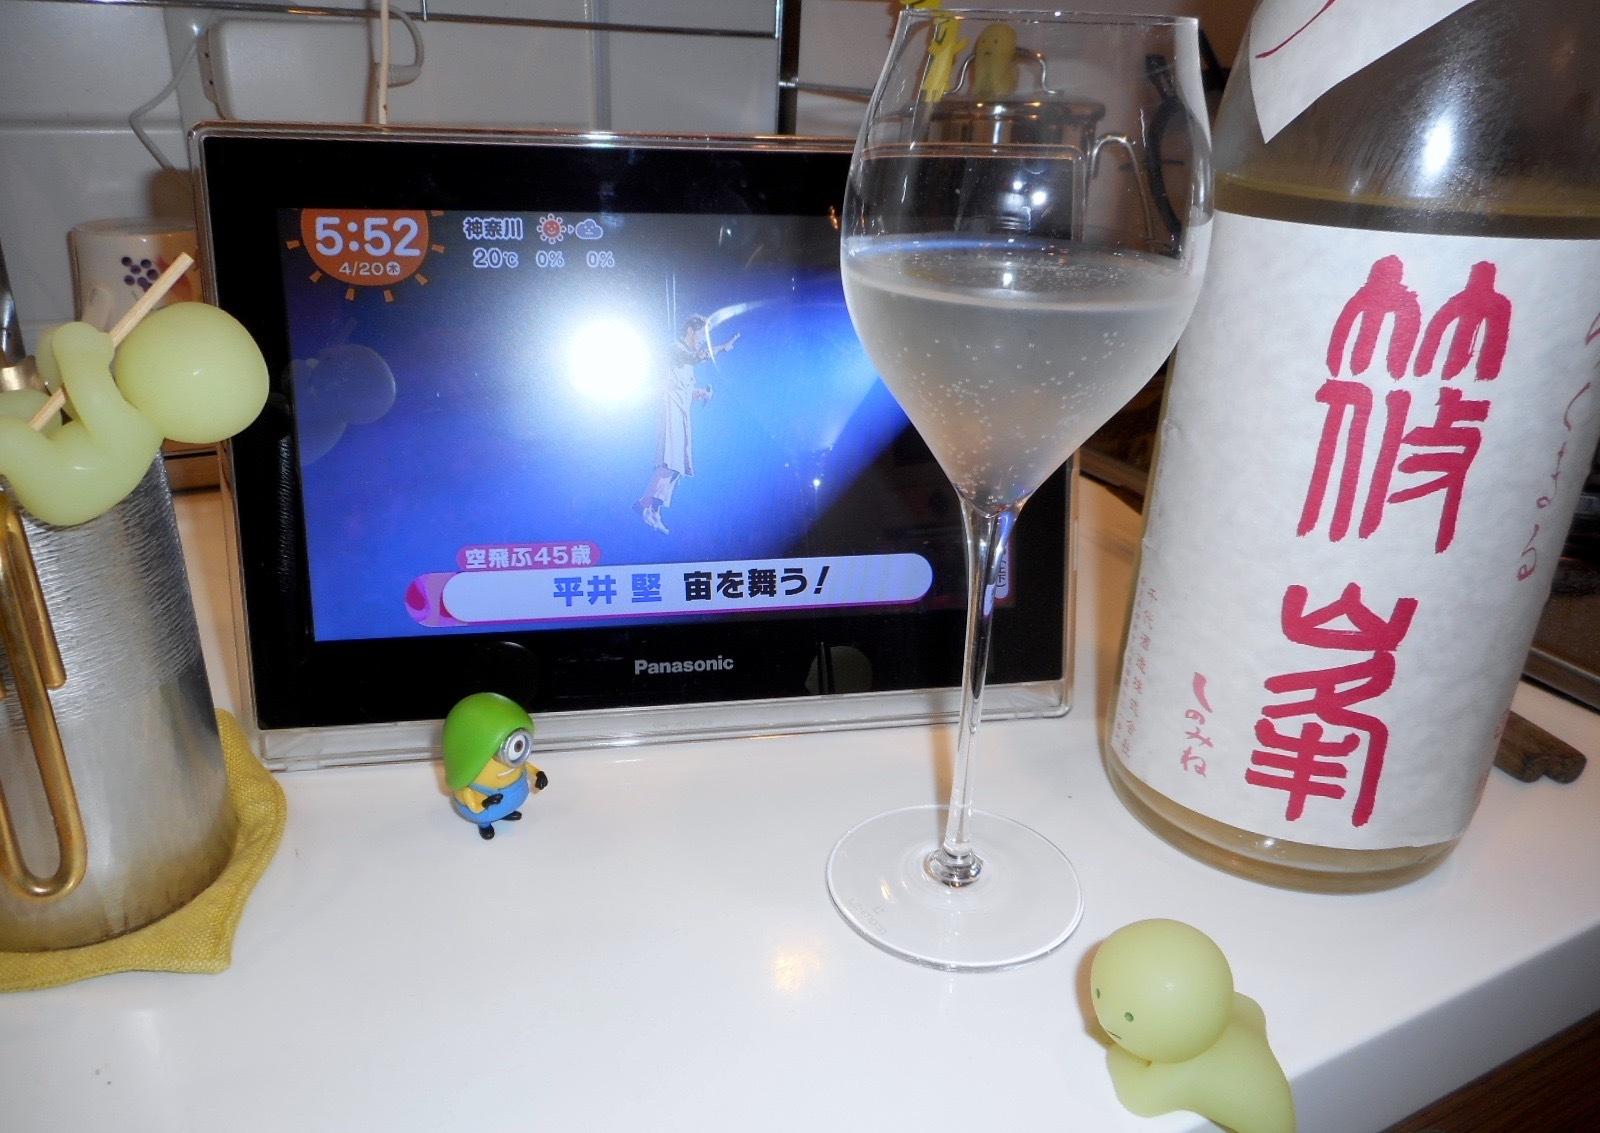 rokumaru_oyama_usunigori26by11.jpg